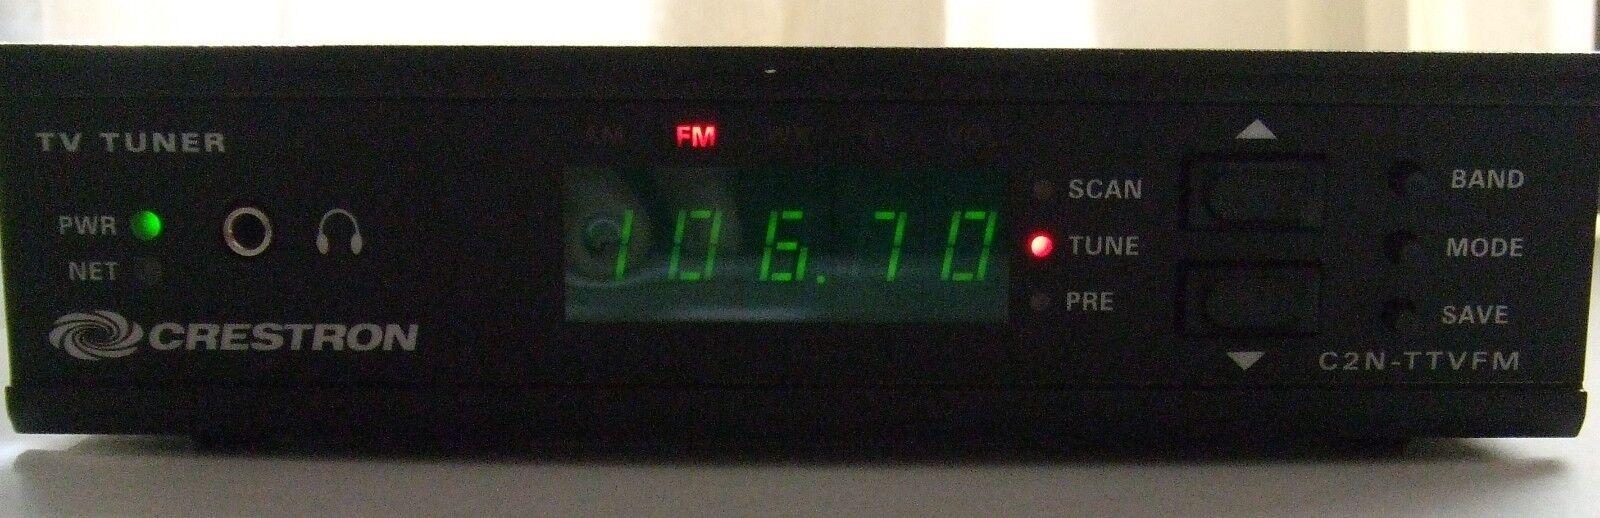 CRESTRON C2N-TTVFM TV AND FM TUNER